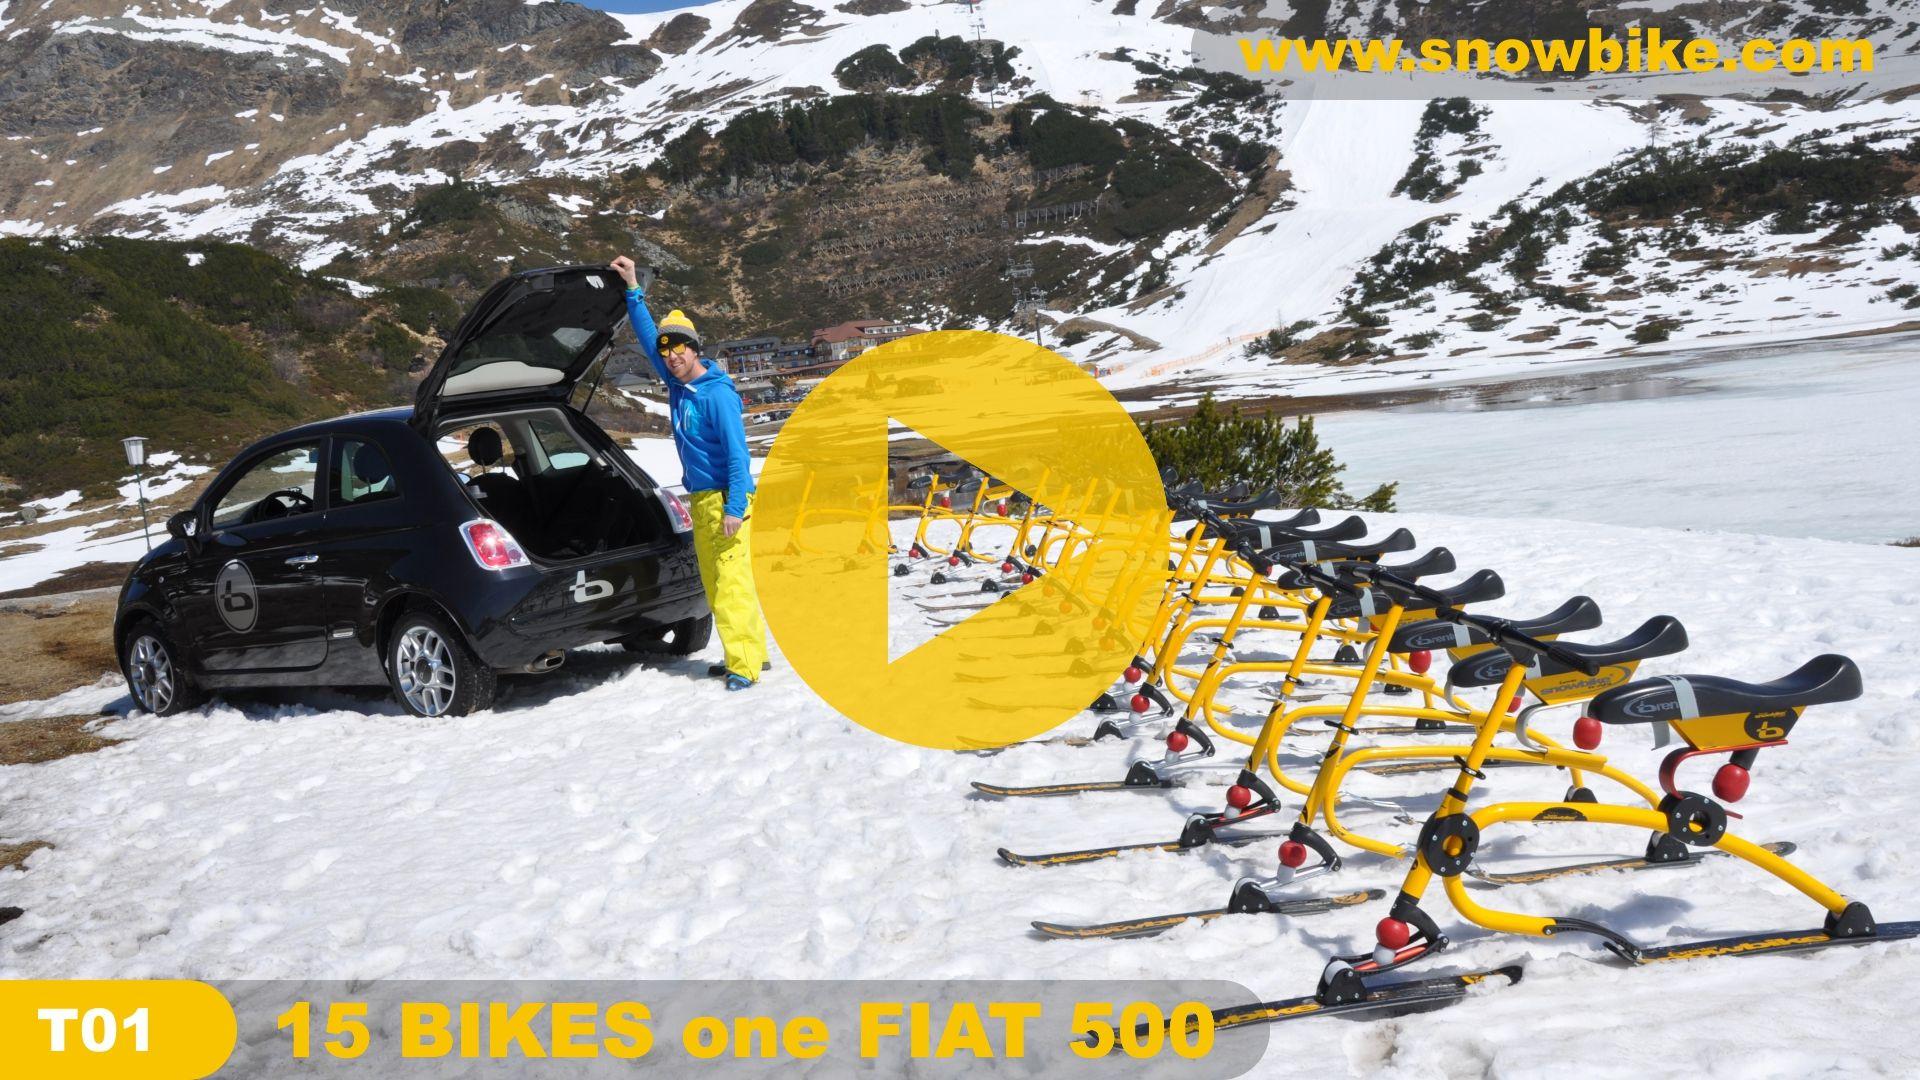 15-snowbikes-in-a-fiat-500-cover3C67B12E-2BC0-5FAC-B6CC-5CC40EBB62AE.jpg